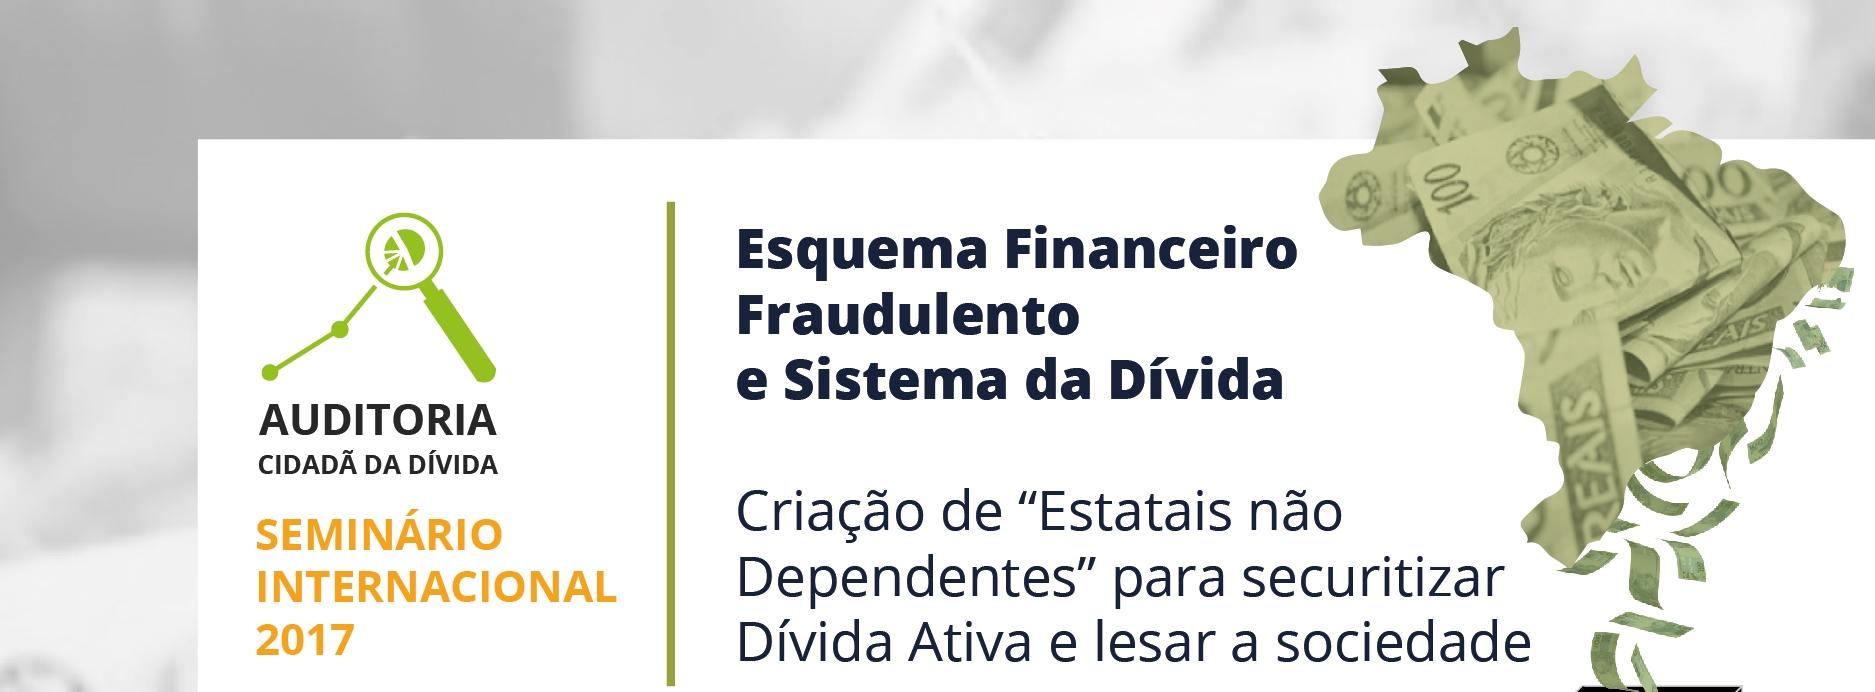 ASBIN participa de seminário internacional sobre esquemas fraudulentos